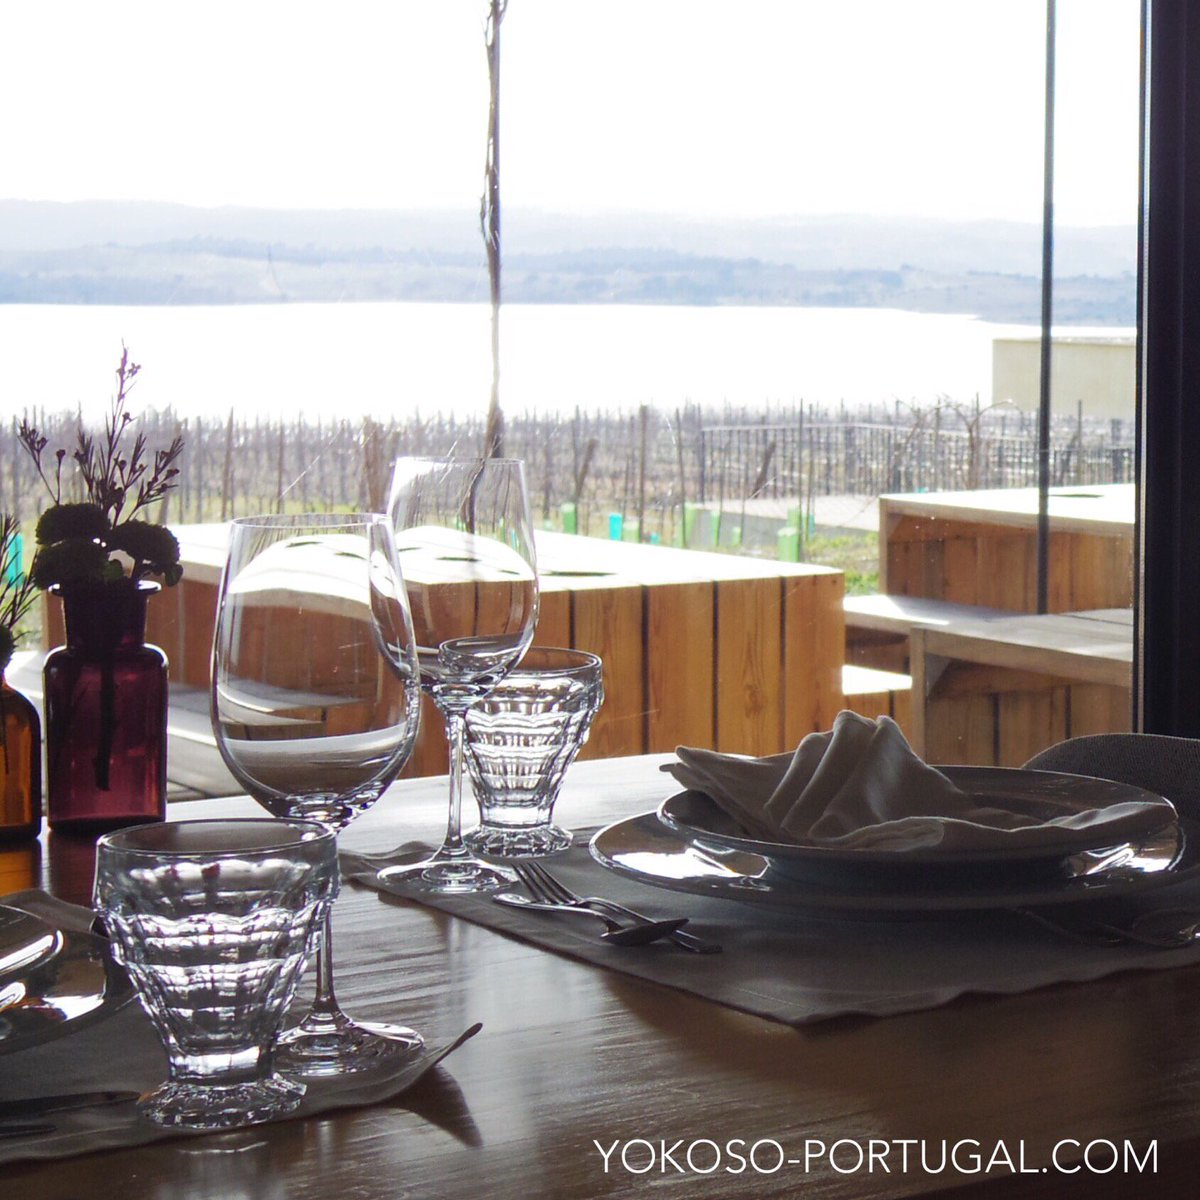 test ツイッターメディア - ワイナリー併設の眺めの良いレストラン。敷地内でとれたオーガニック野菜とおいしいワインがいただけます。リスボンからは世界遺産のエヴォラと、かわいいらしい村モンサラーシュを組み合わせた... https://t.co/NncilmYC7p https://t.co/LnuFK72Ick